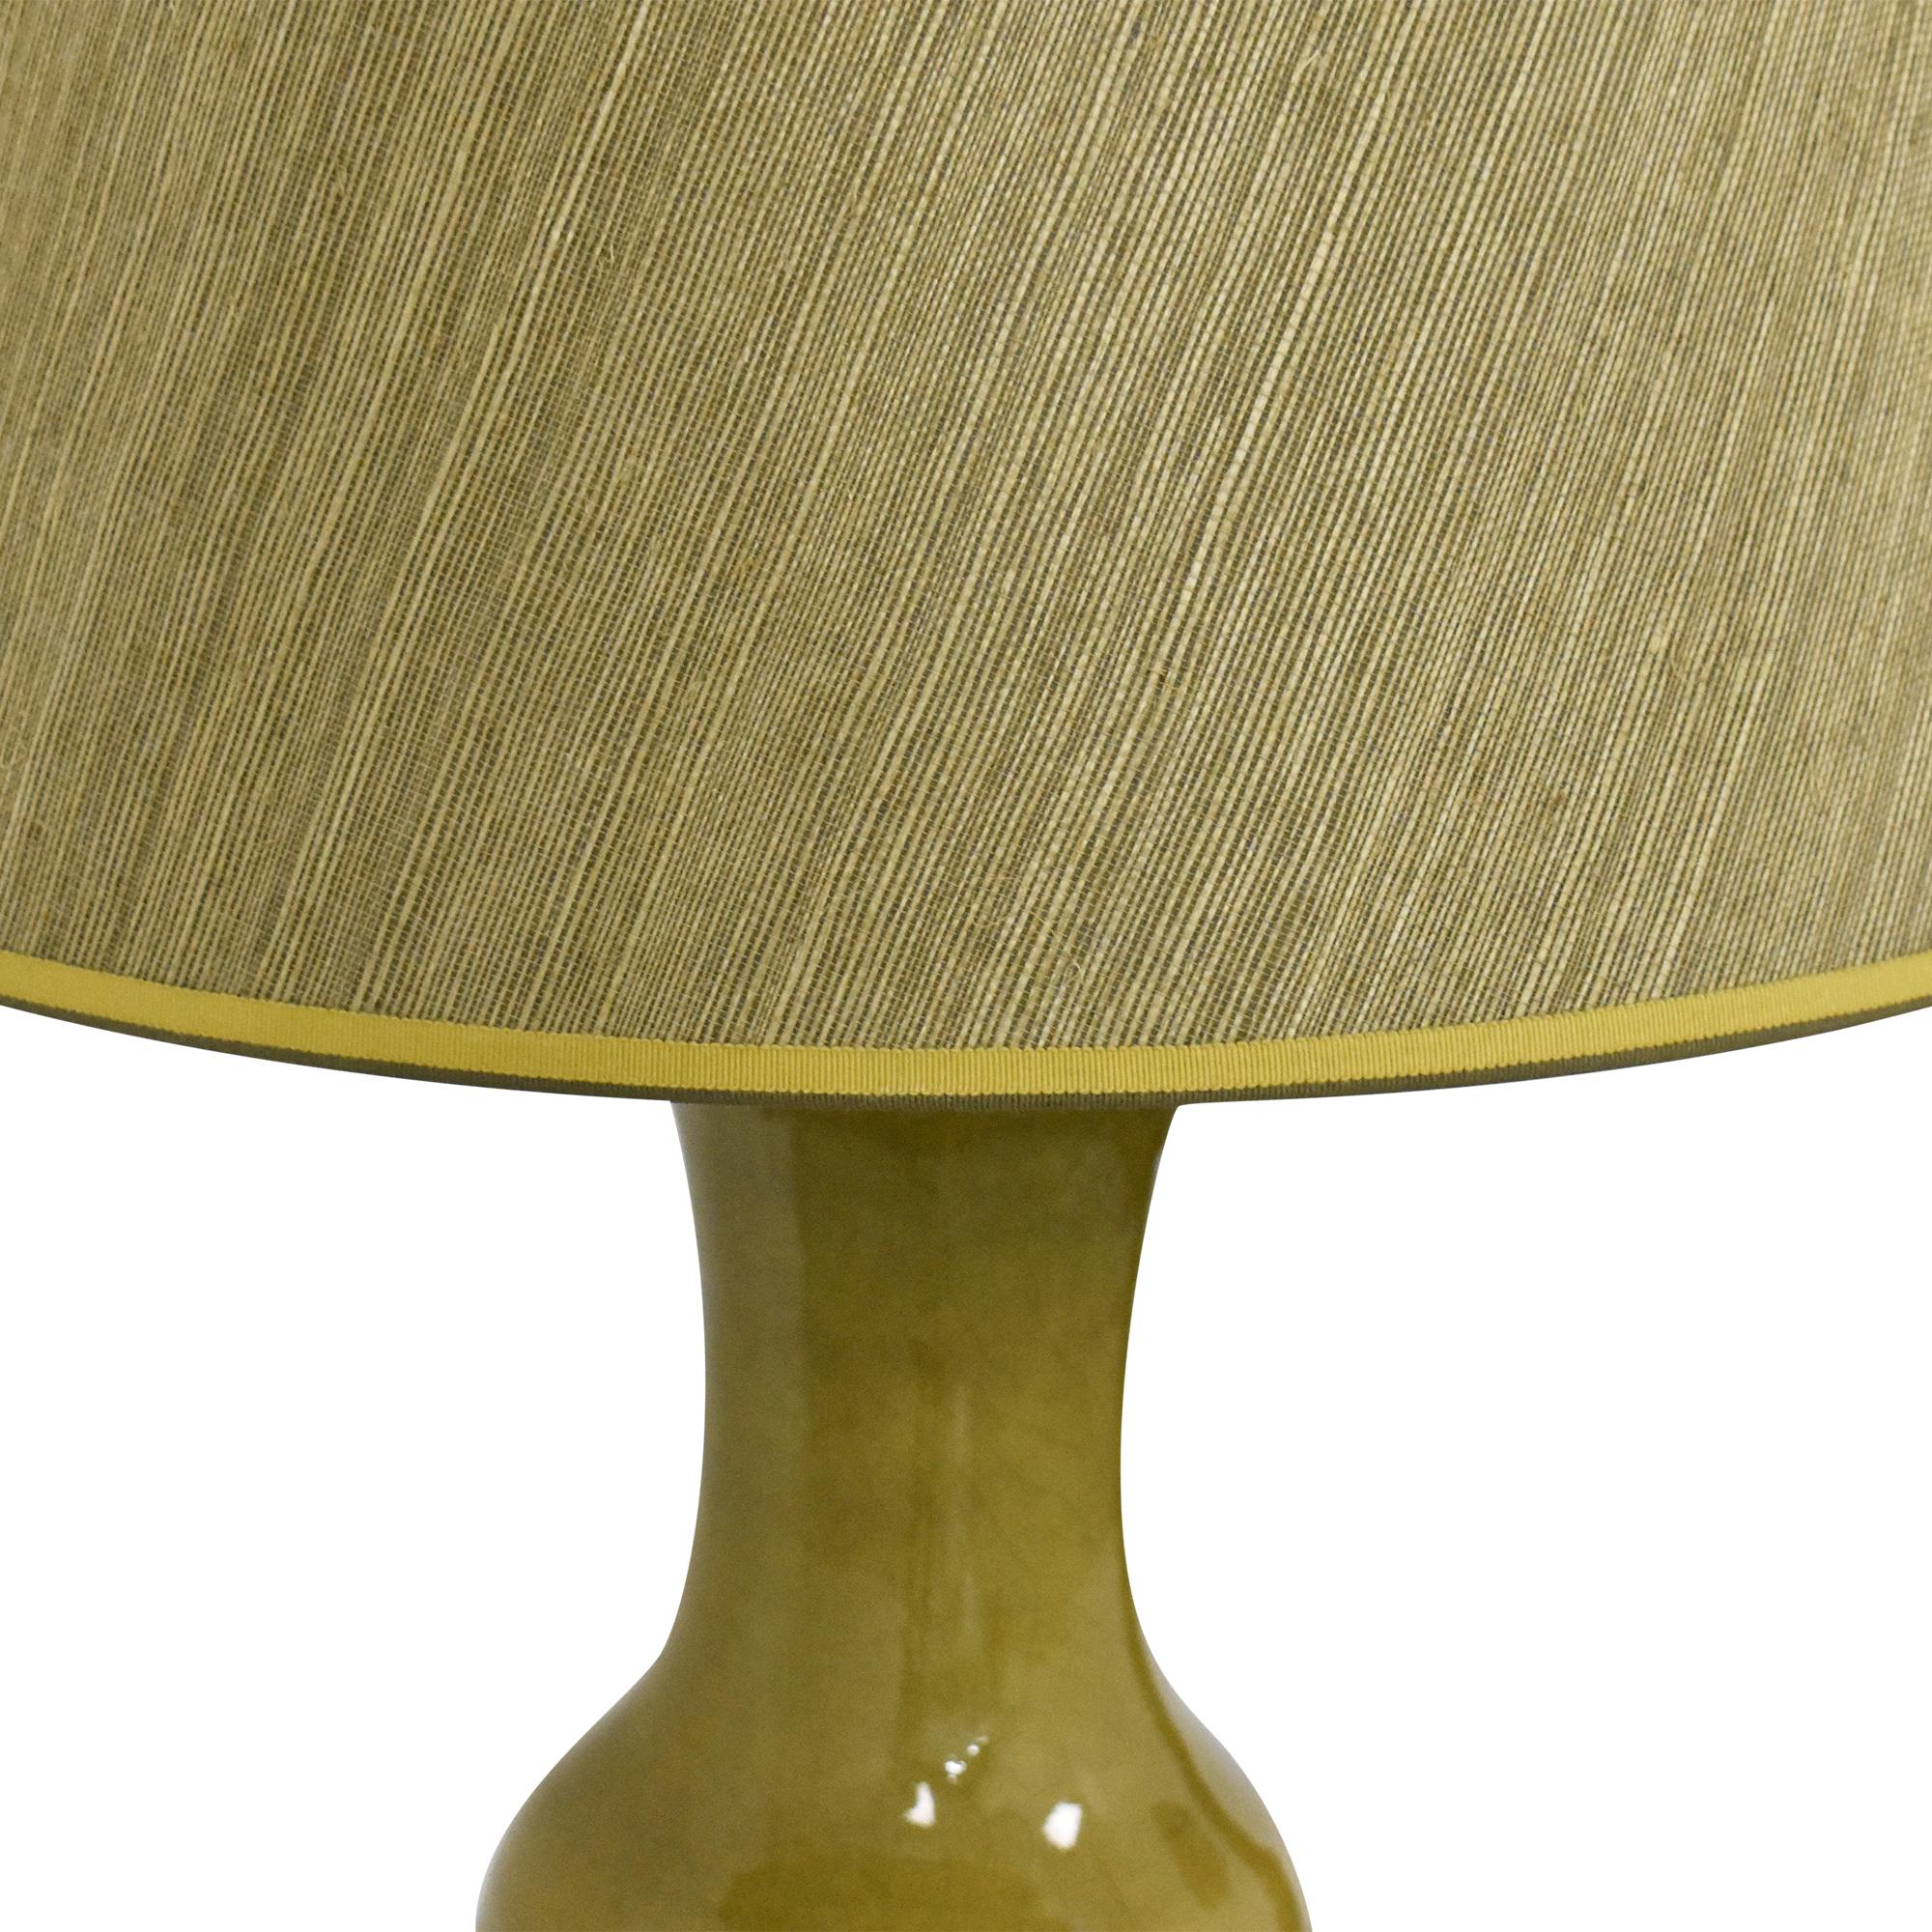 Warren Kessler Warren Kessler Urn Table Lamps on sale